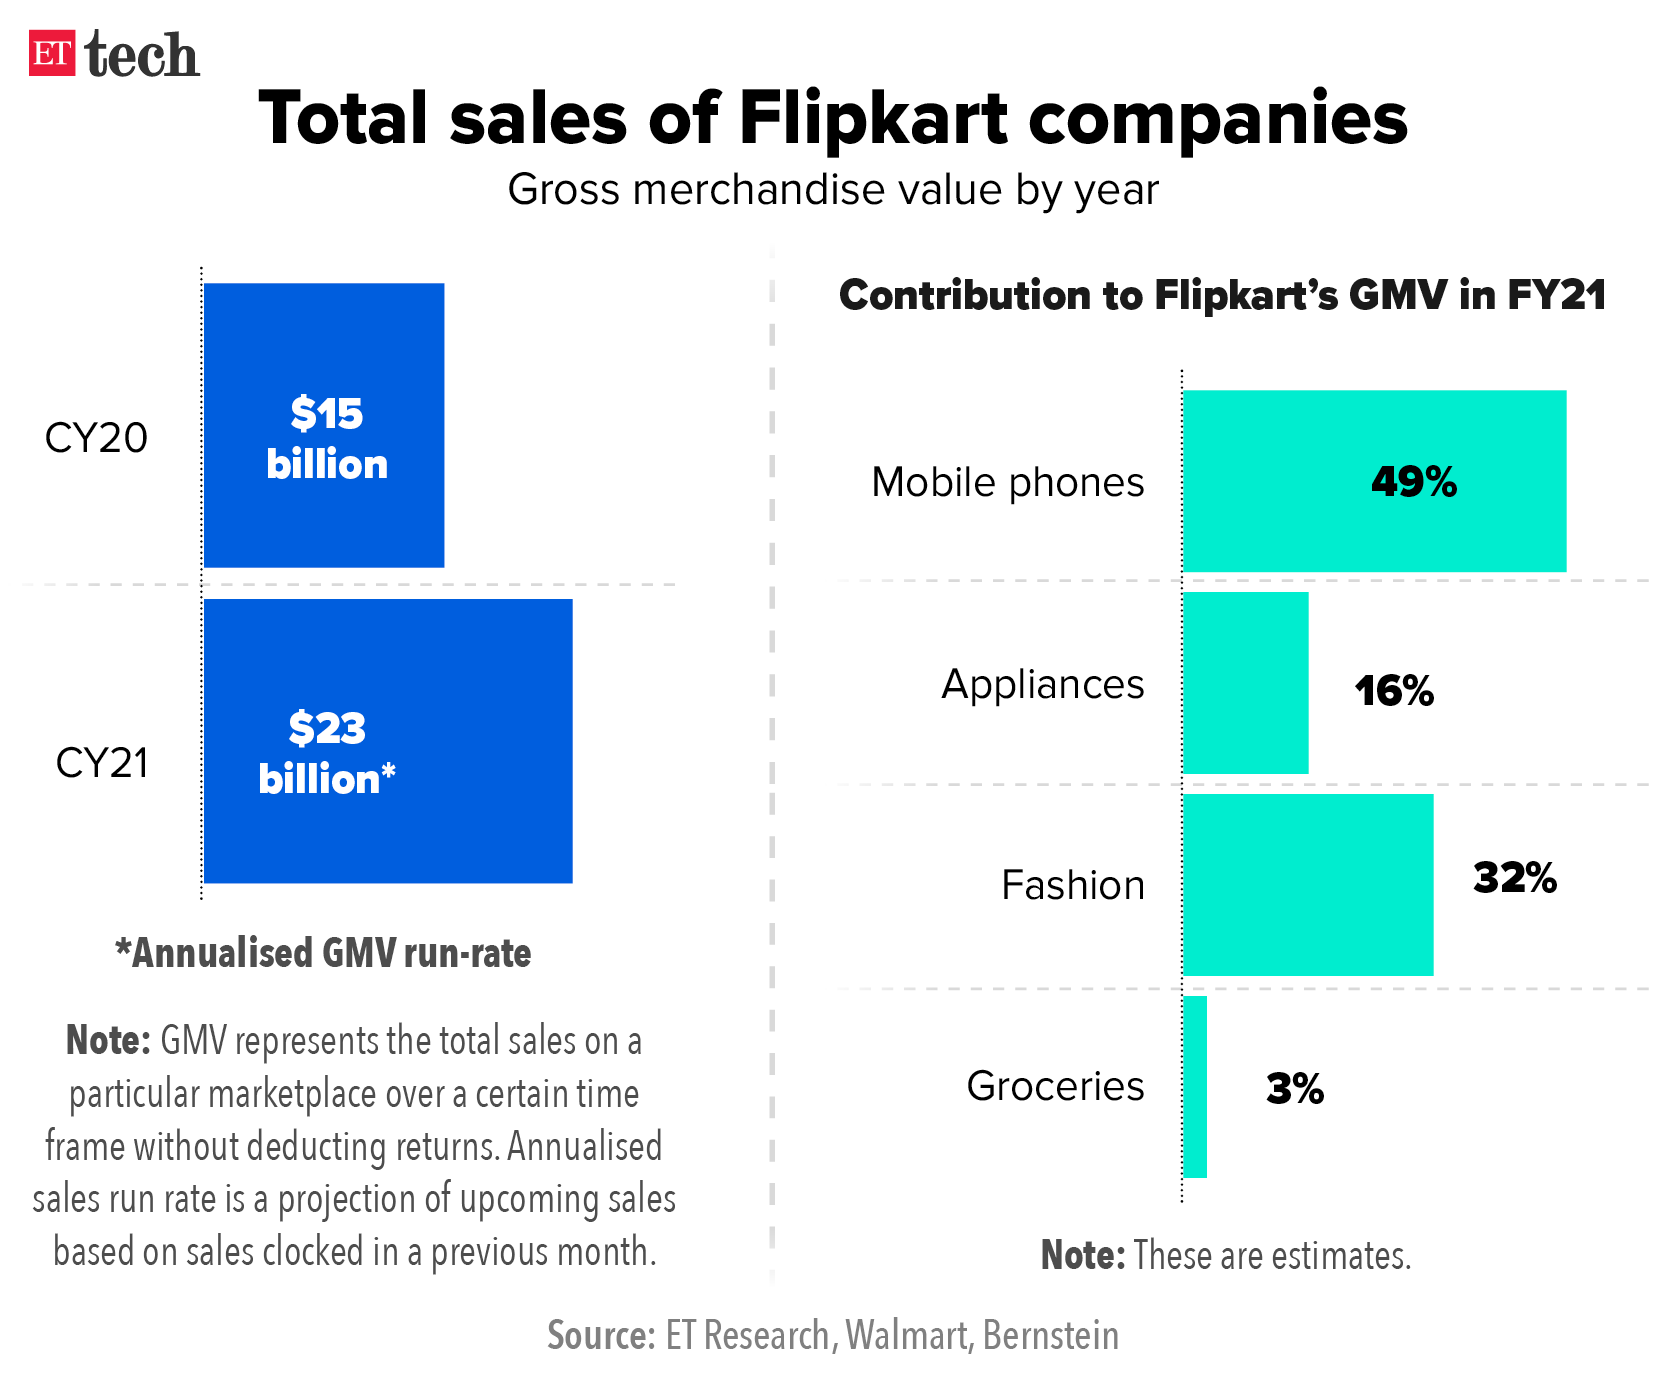 Total sales of Flipkart